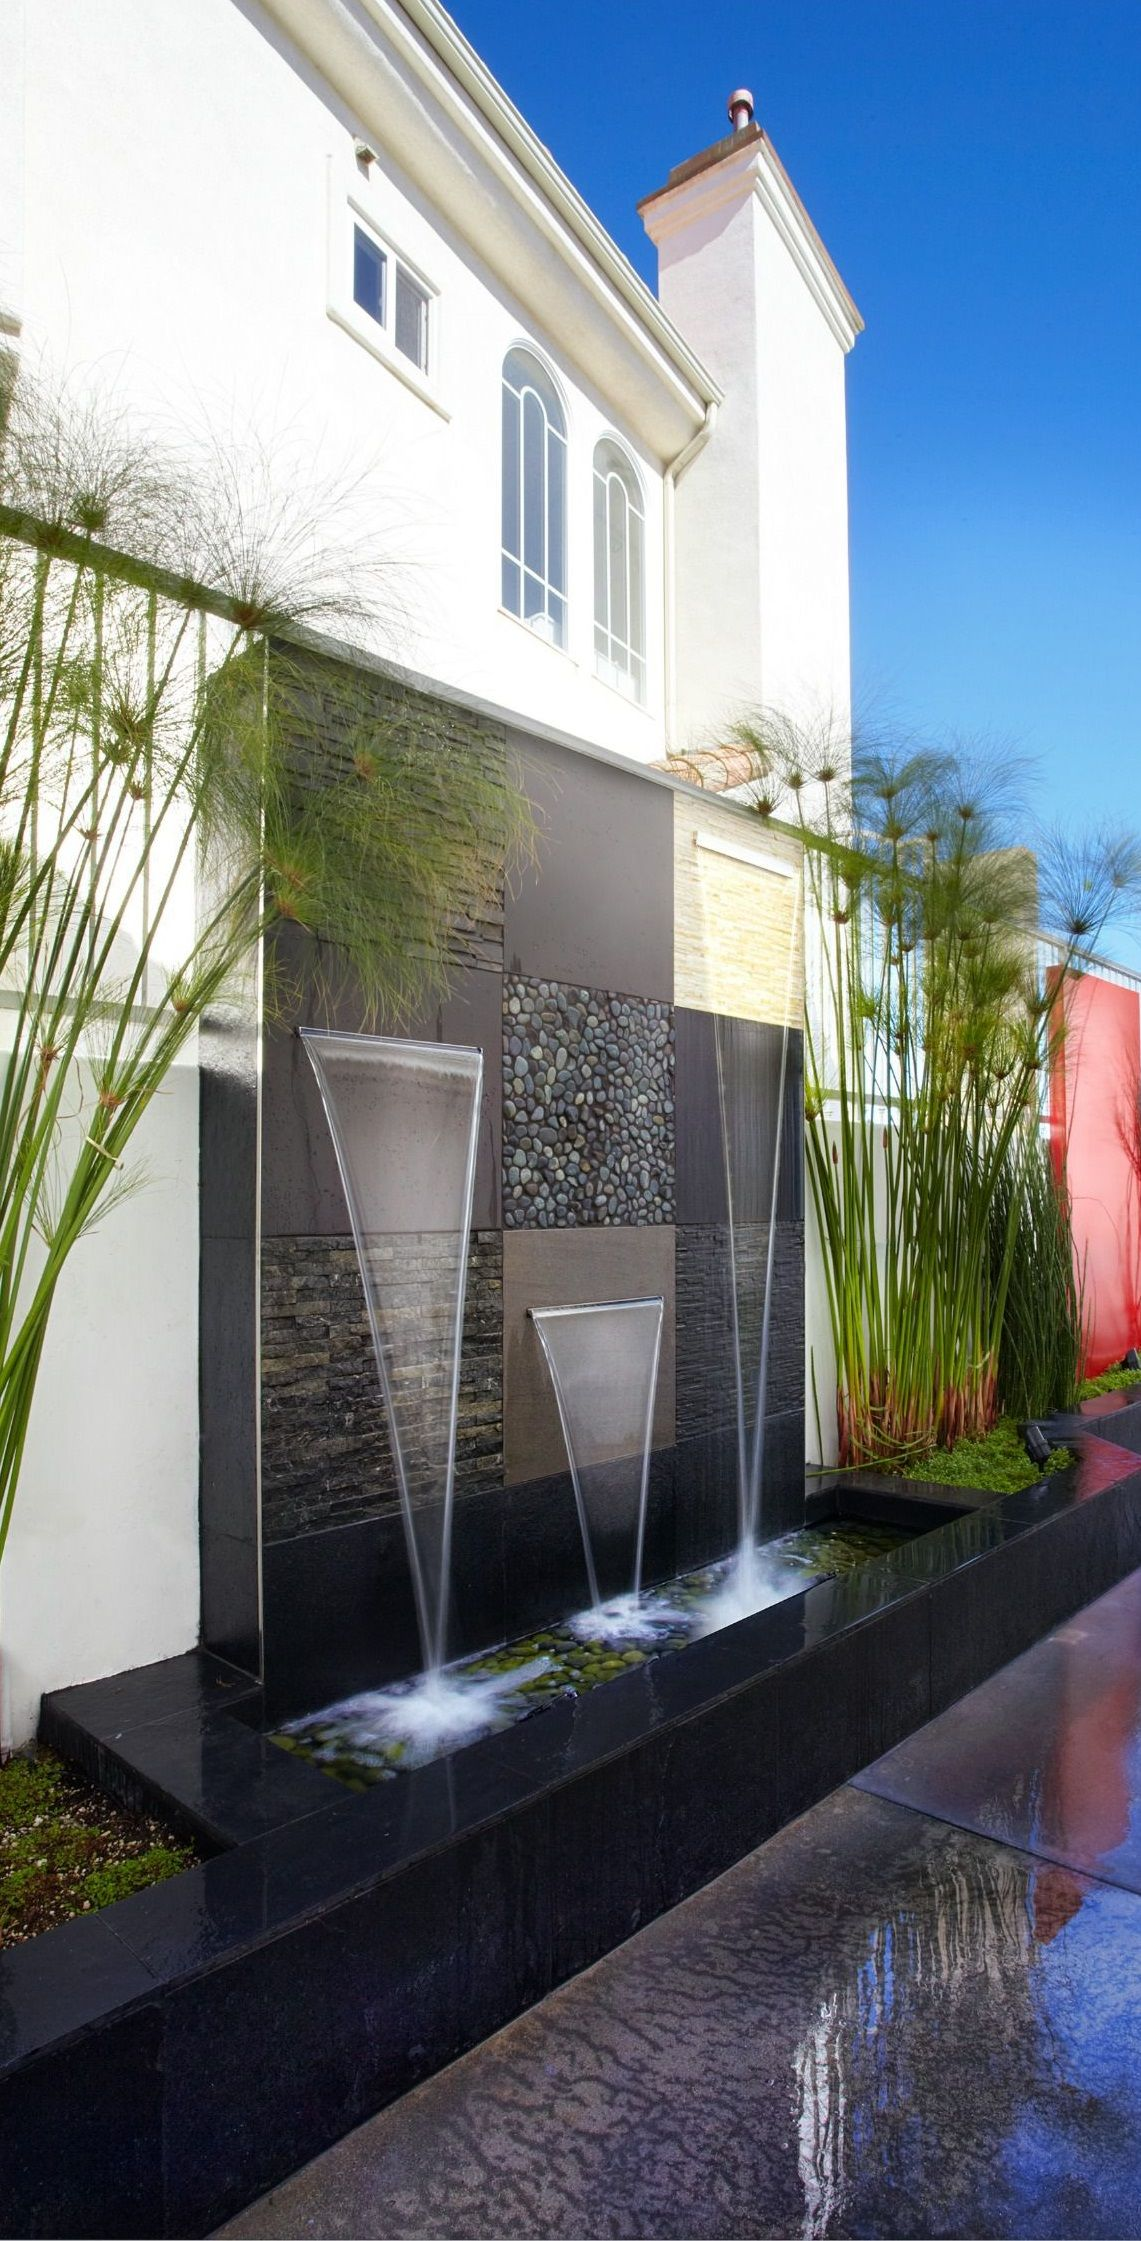 Awesome Outdoor Water Walls Best Inspiring Ideas Courtyard Gardens Design Rooftop Design Small Backyard Garden Design Modern outdoor water feature ideas